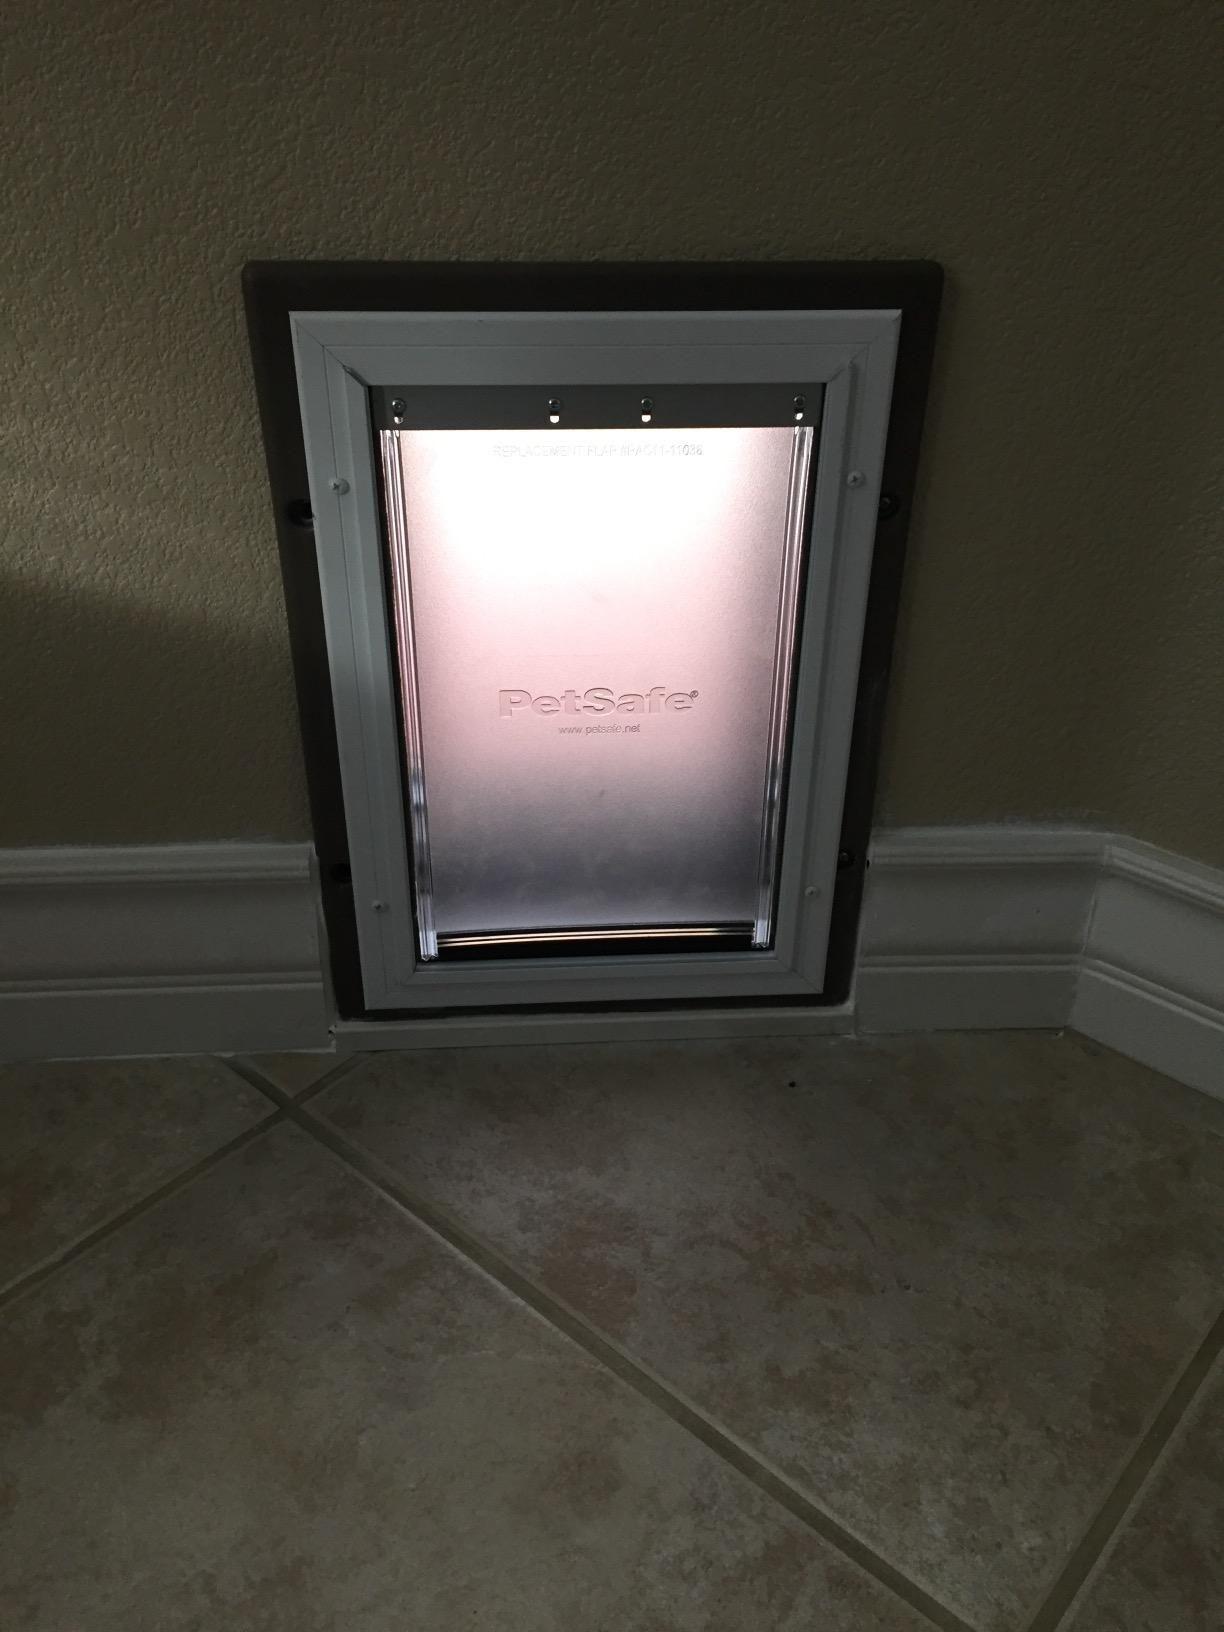 The Petsafe Wall Entry Pet Door Allows You To Install Your New Pet Door Into An Interior Or Exterior Wall Instead Of A Dog Door Automatic Dog Door Royal Doors